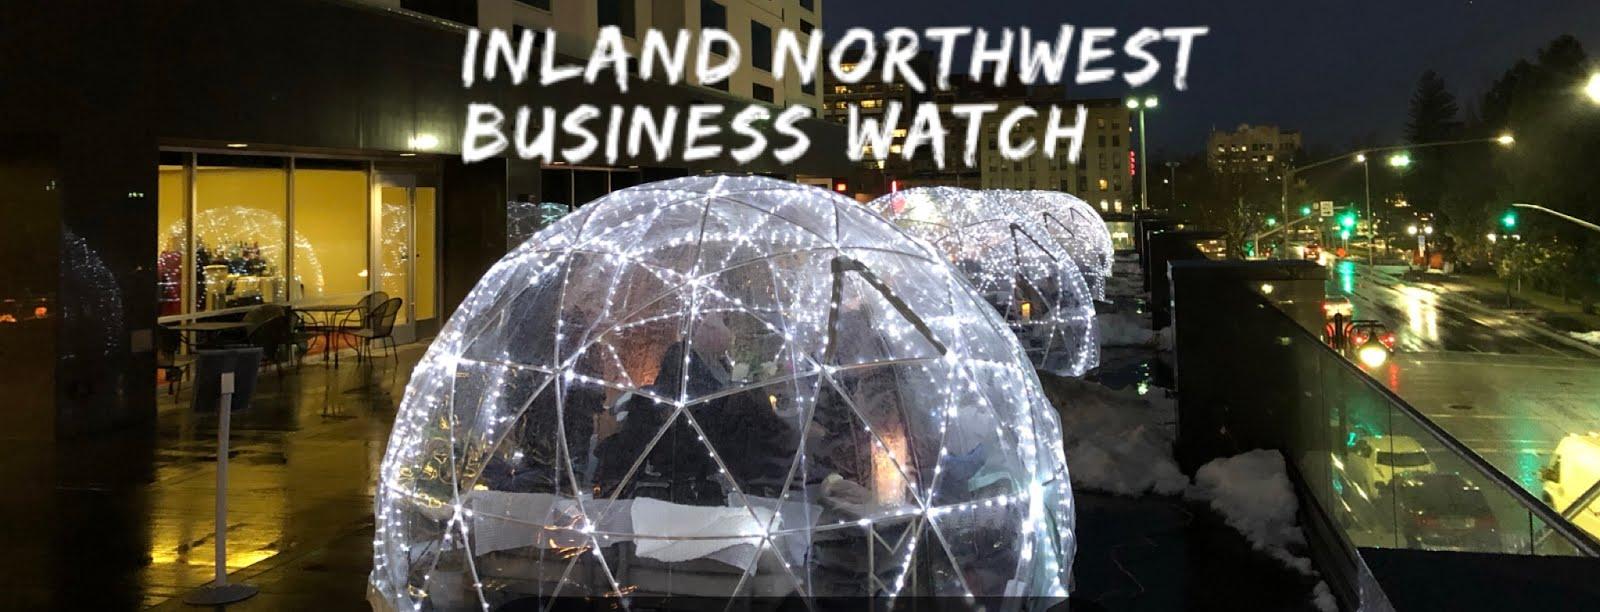 Inland Northwest Business Watch: May 2015